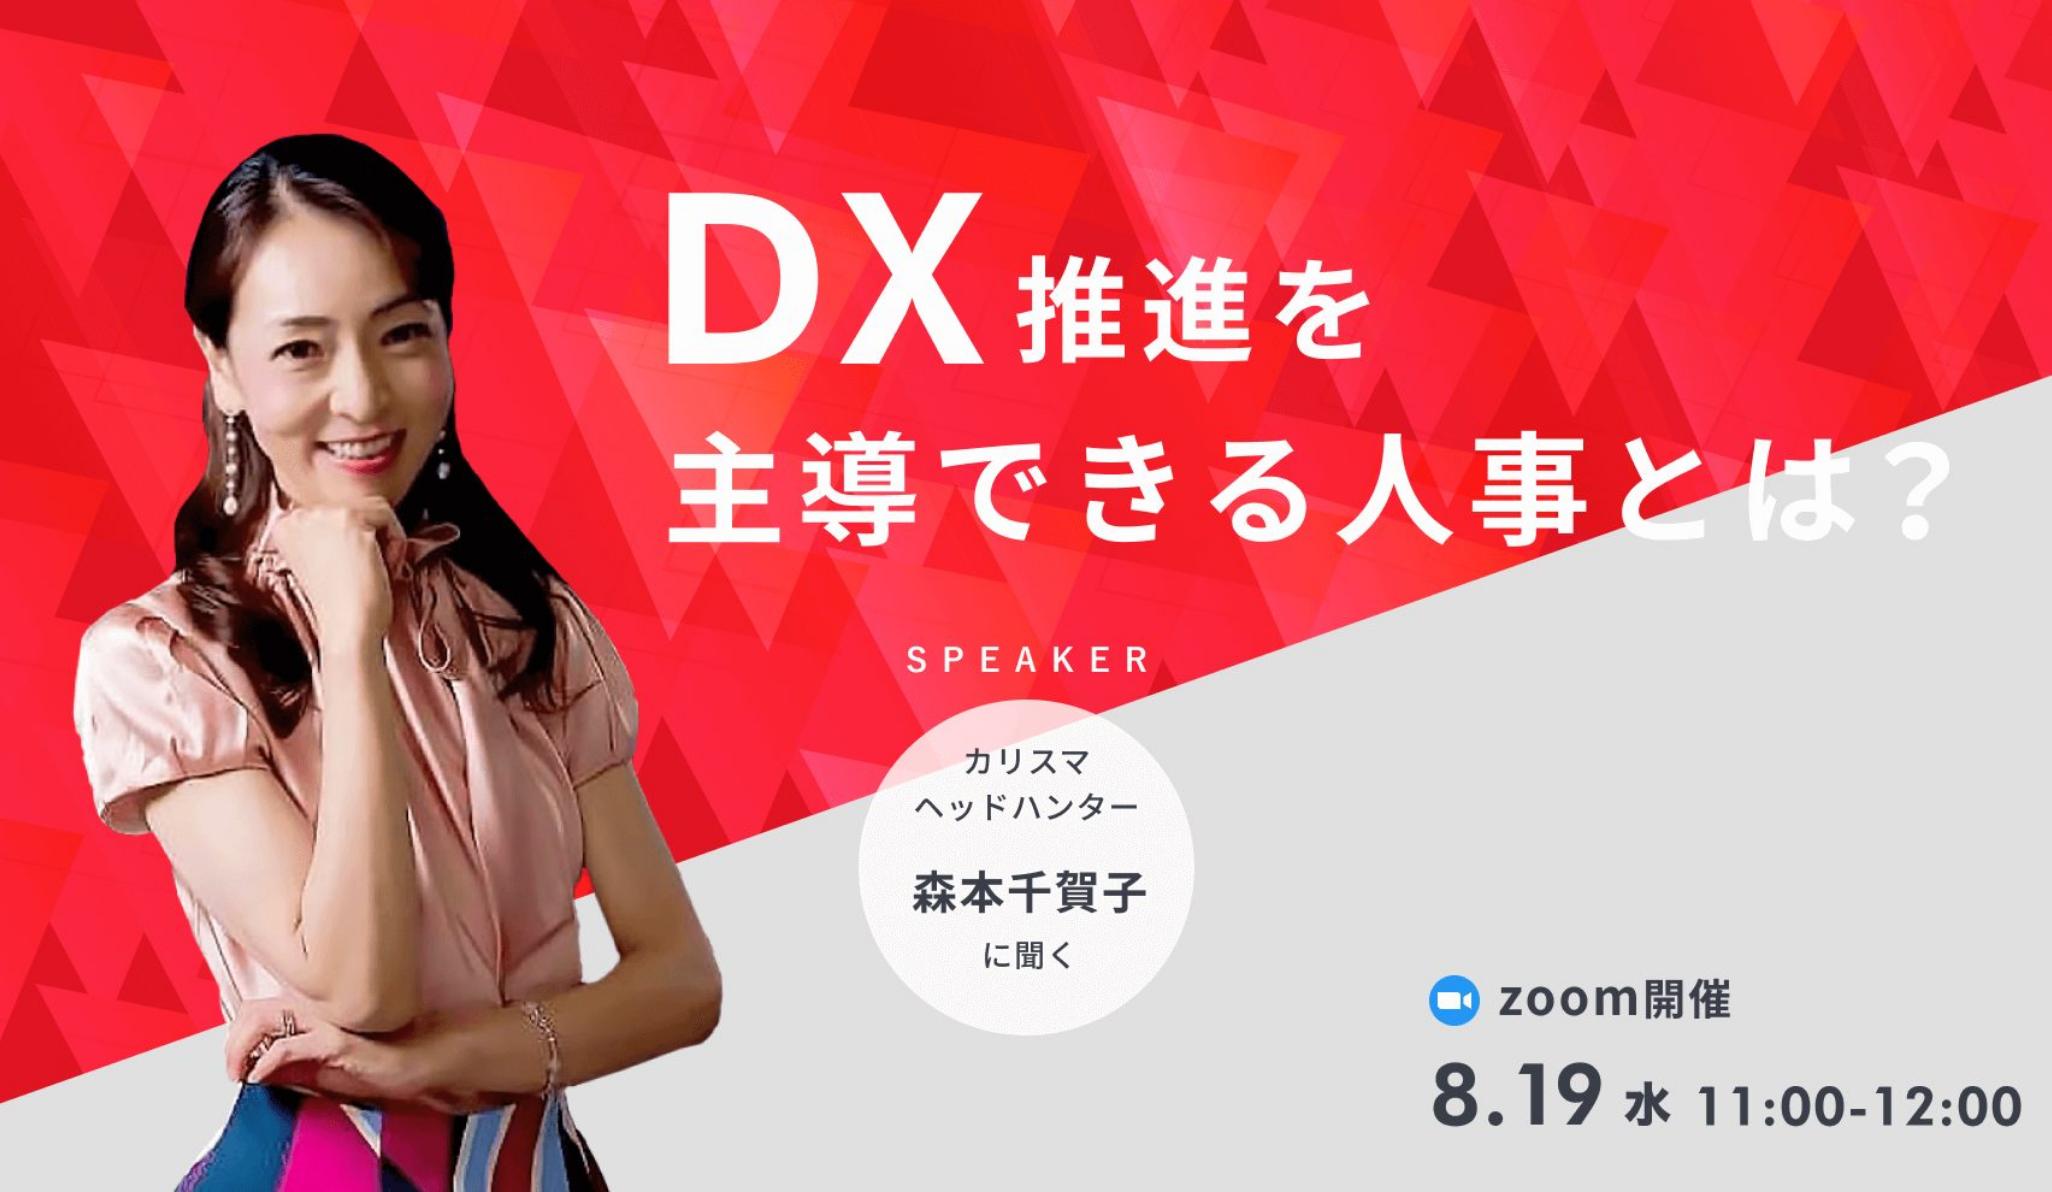 【DX推進を主導できる人事とは?】2020/8/19